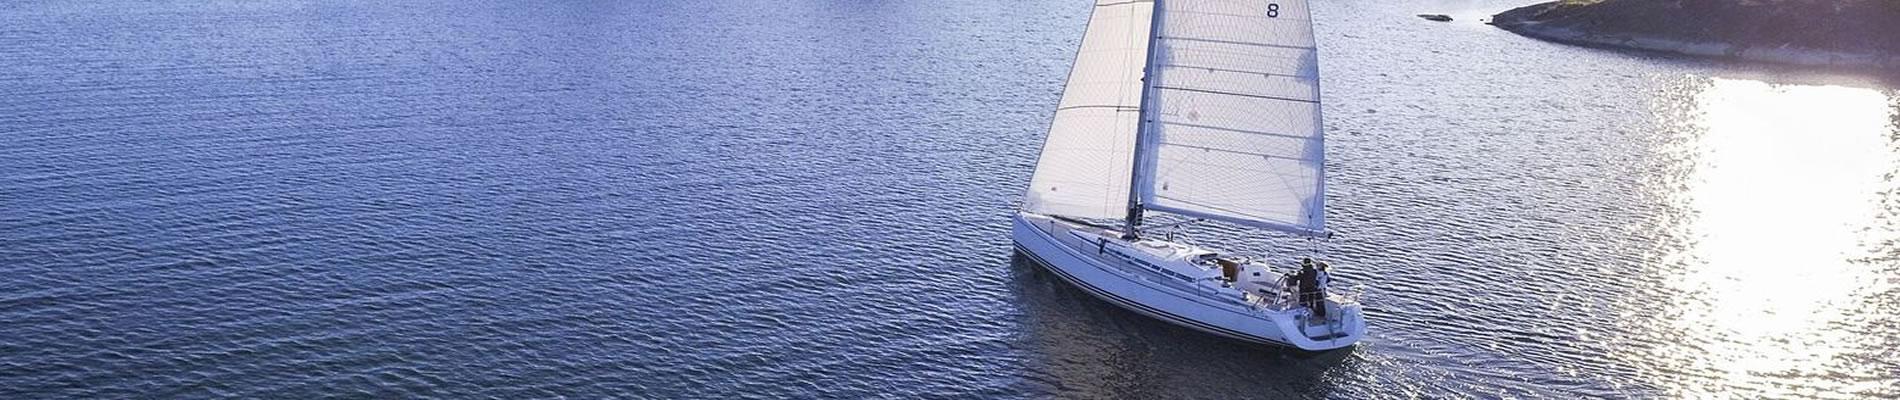 Vela e nautica